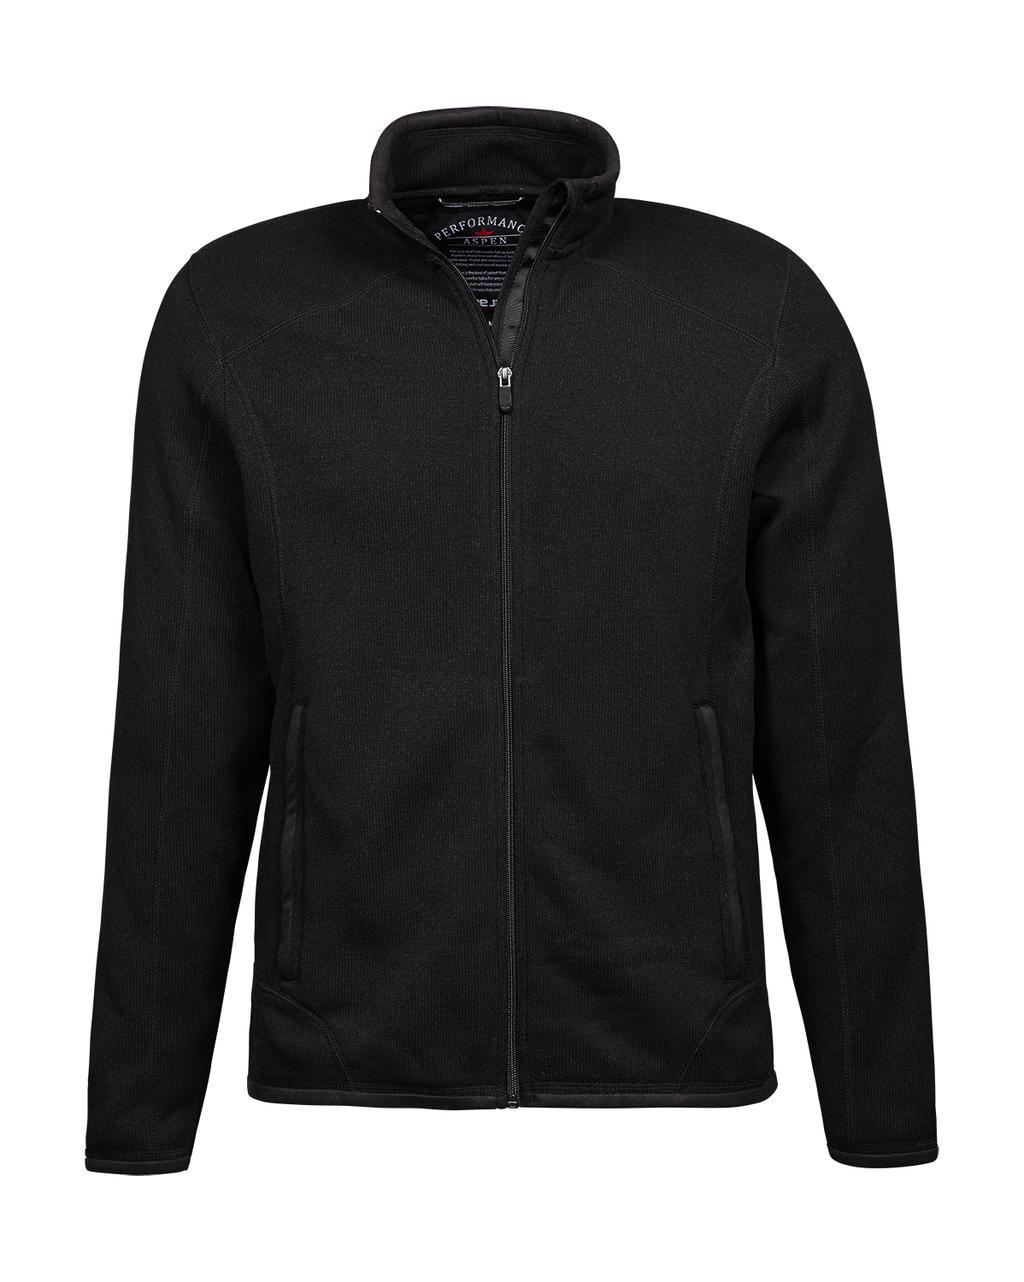 Aspen Fleece Jacket